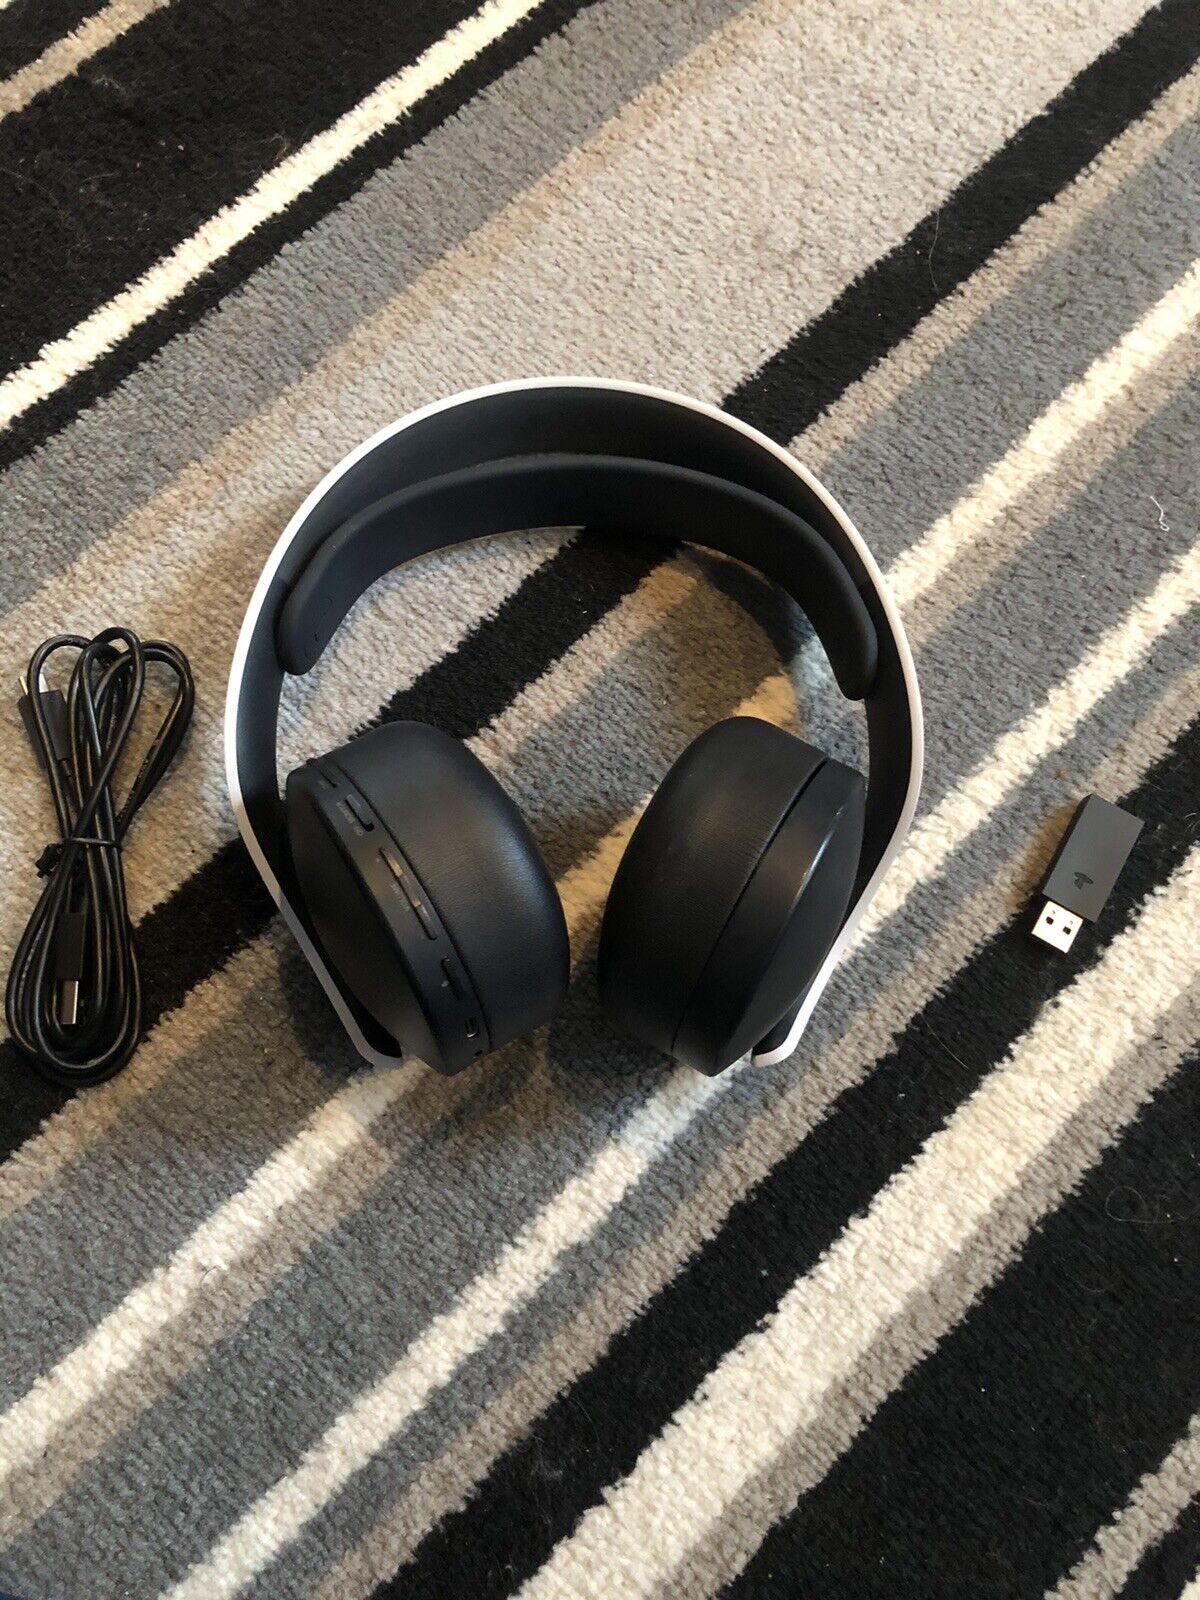 SONY PS5 / Playstation 5 Pulse 3D Wireless Headphones.